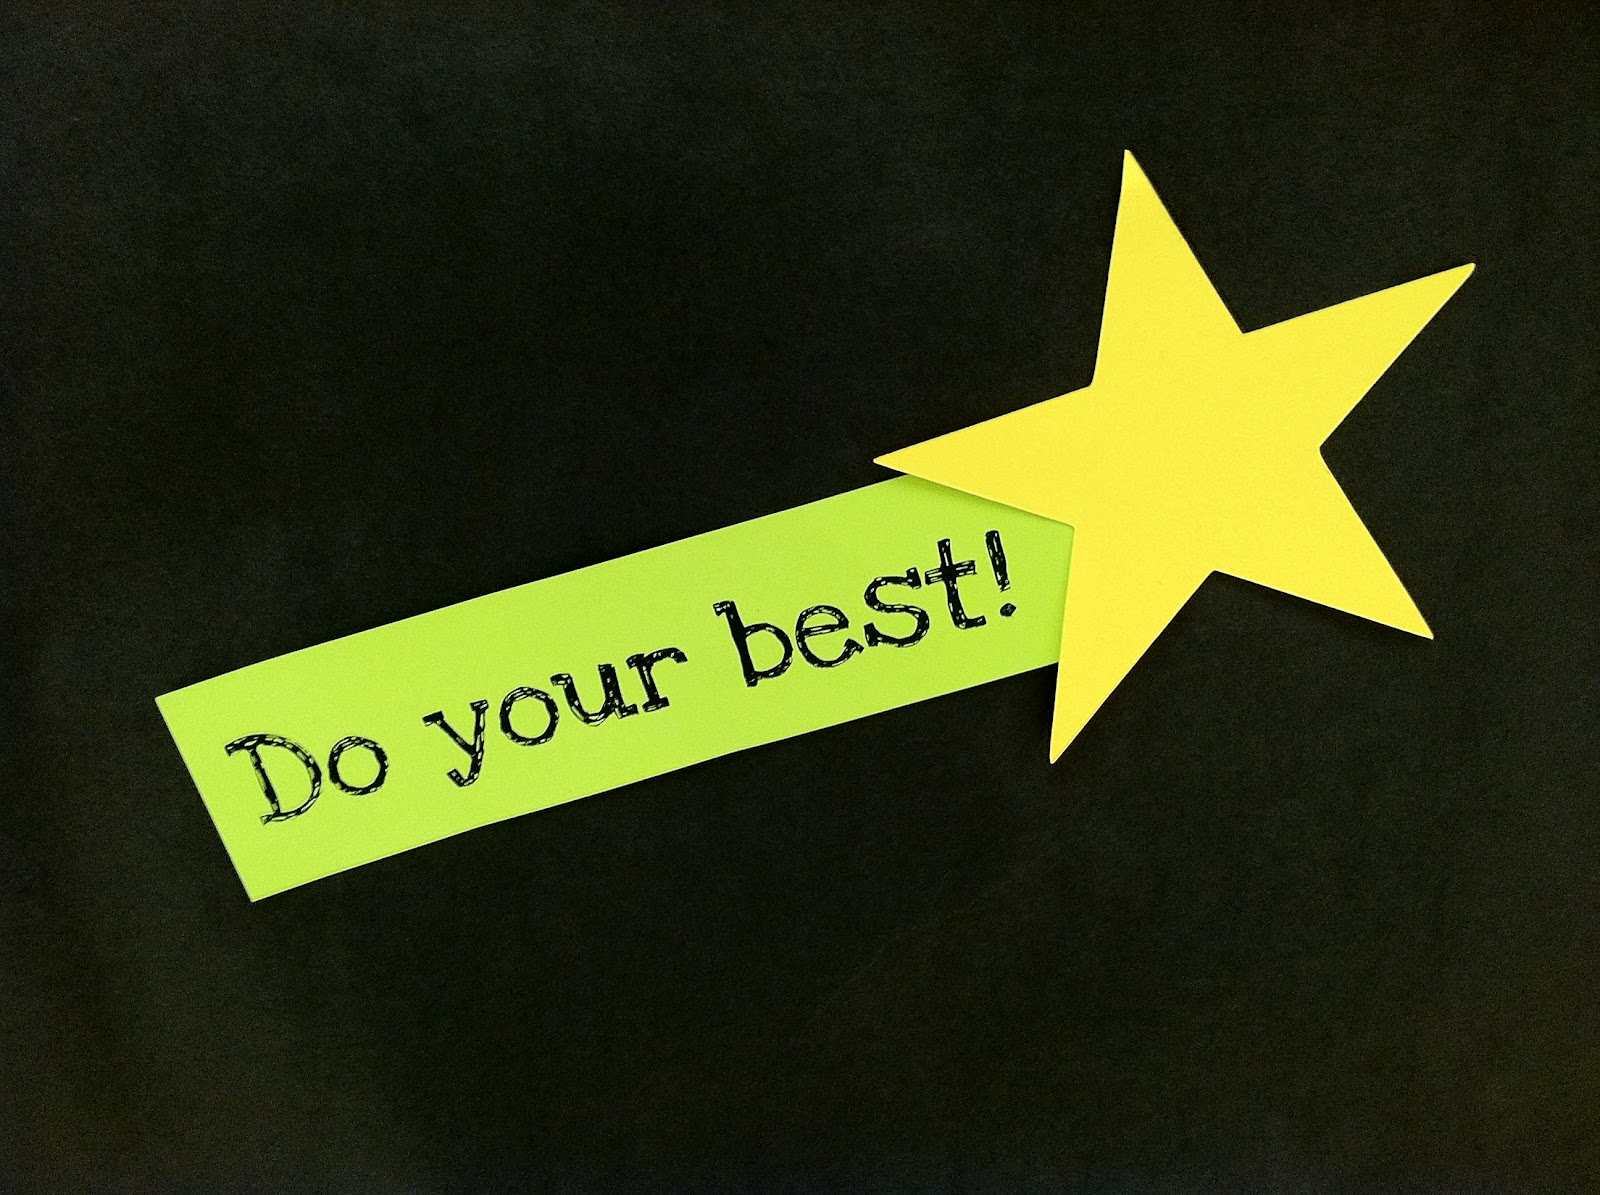 Free Do Good Cliparts, Download Free Clip Art, Free Clip Art.